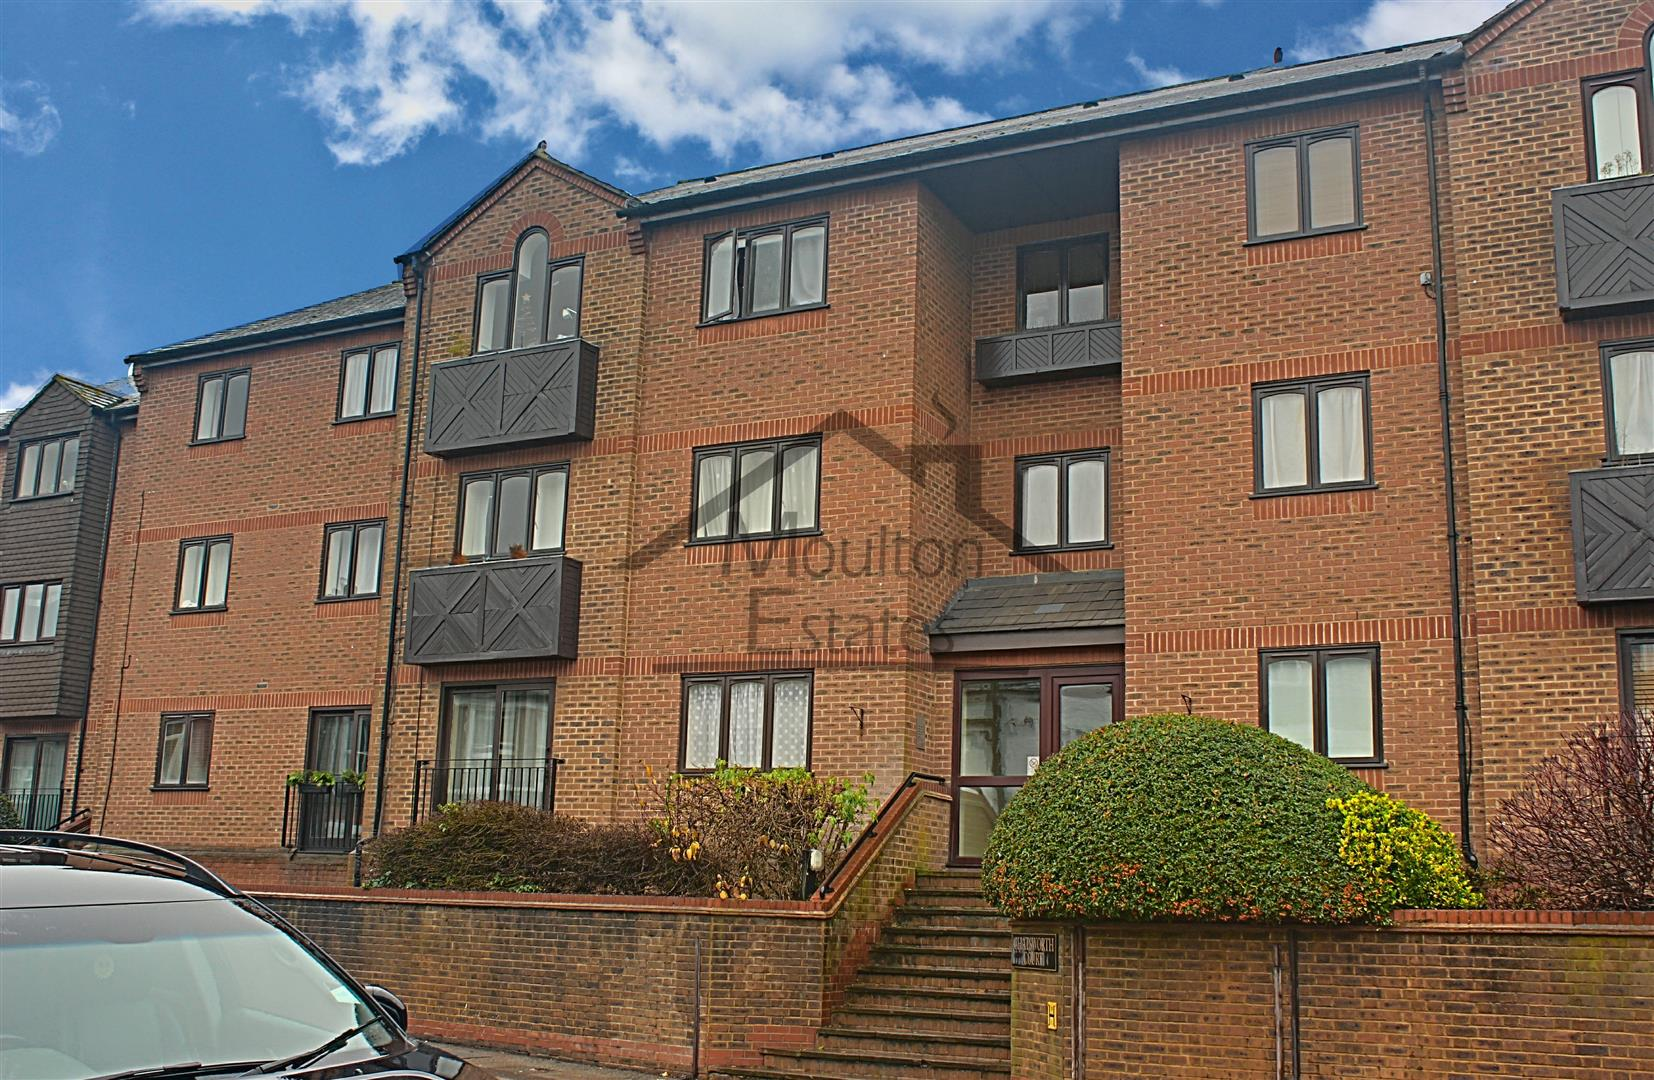 Chatsworth Court, Stanhope Road, St. Albans